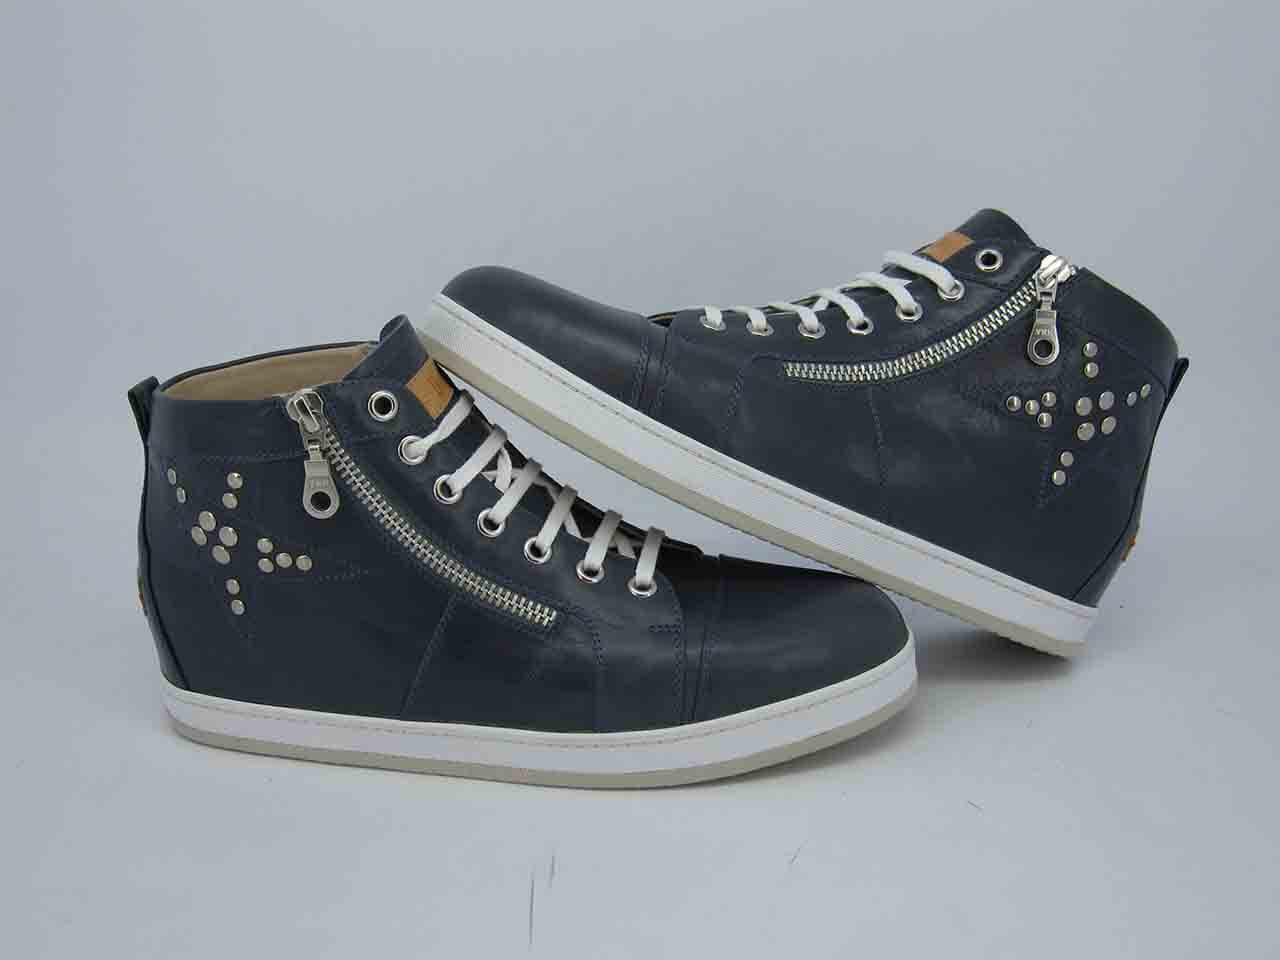 Modieuze orthopedische schoenen